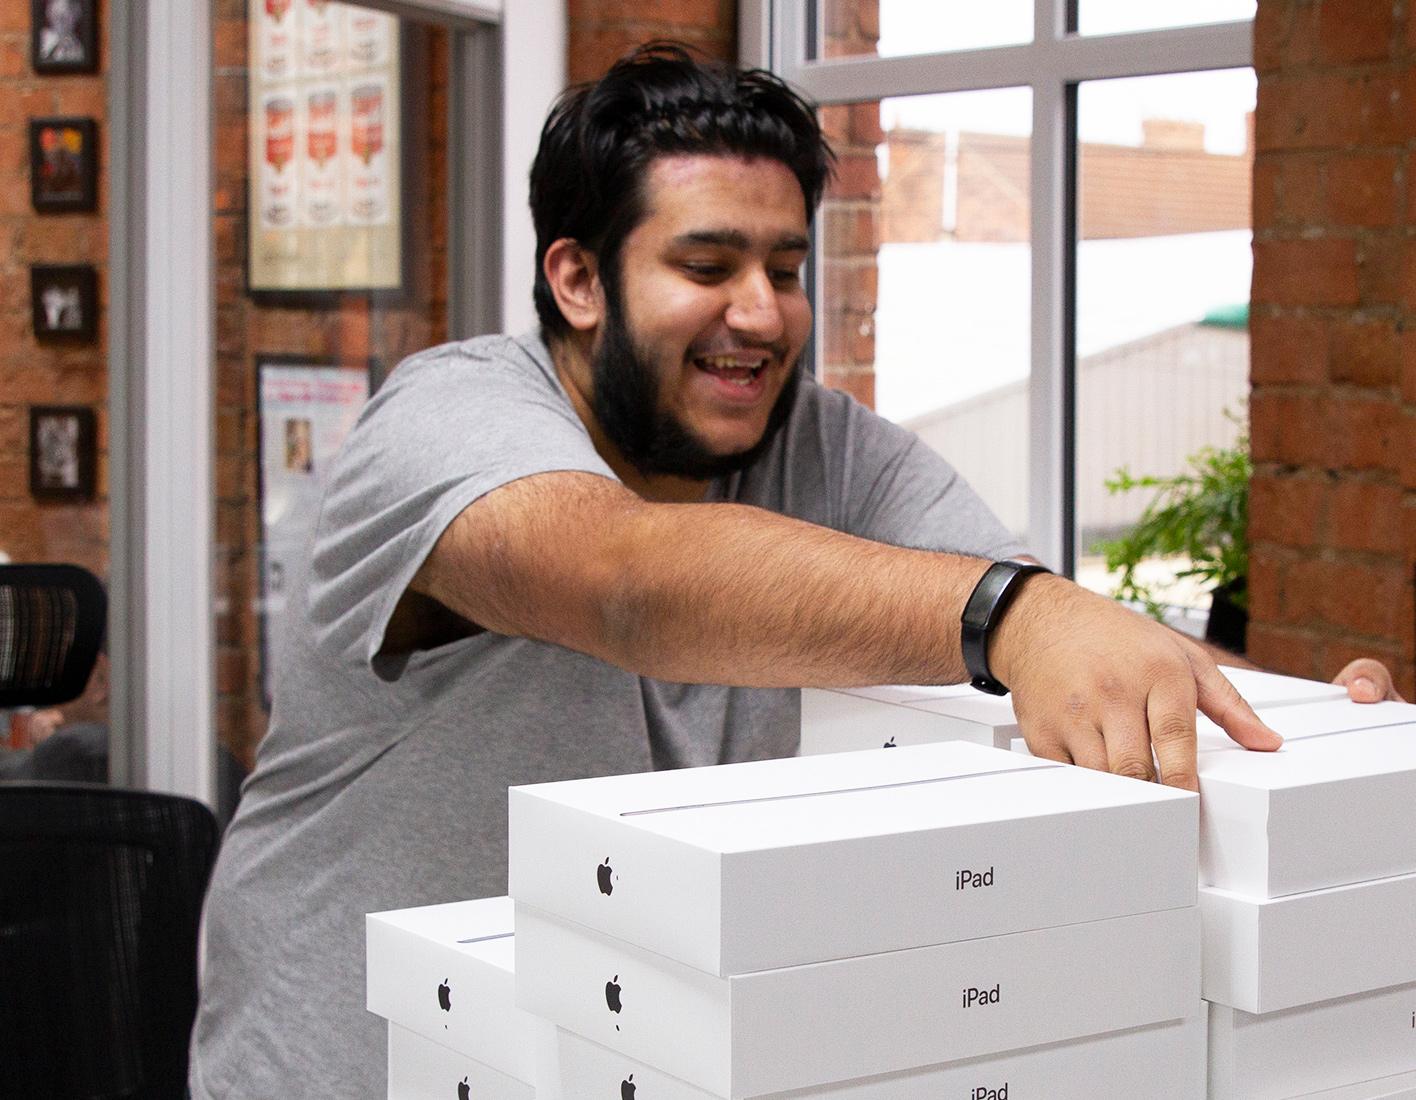 Wasim stacking iPad boxes